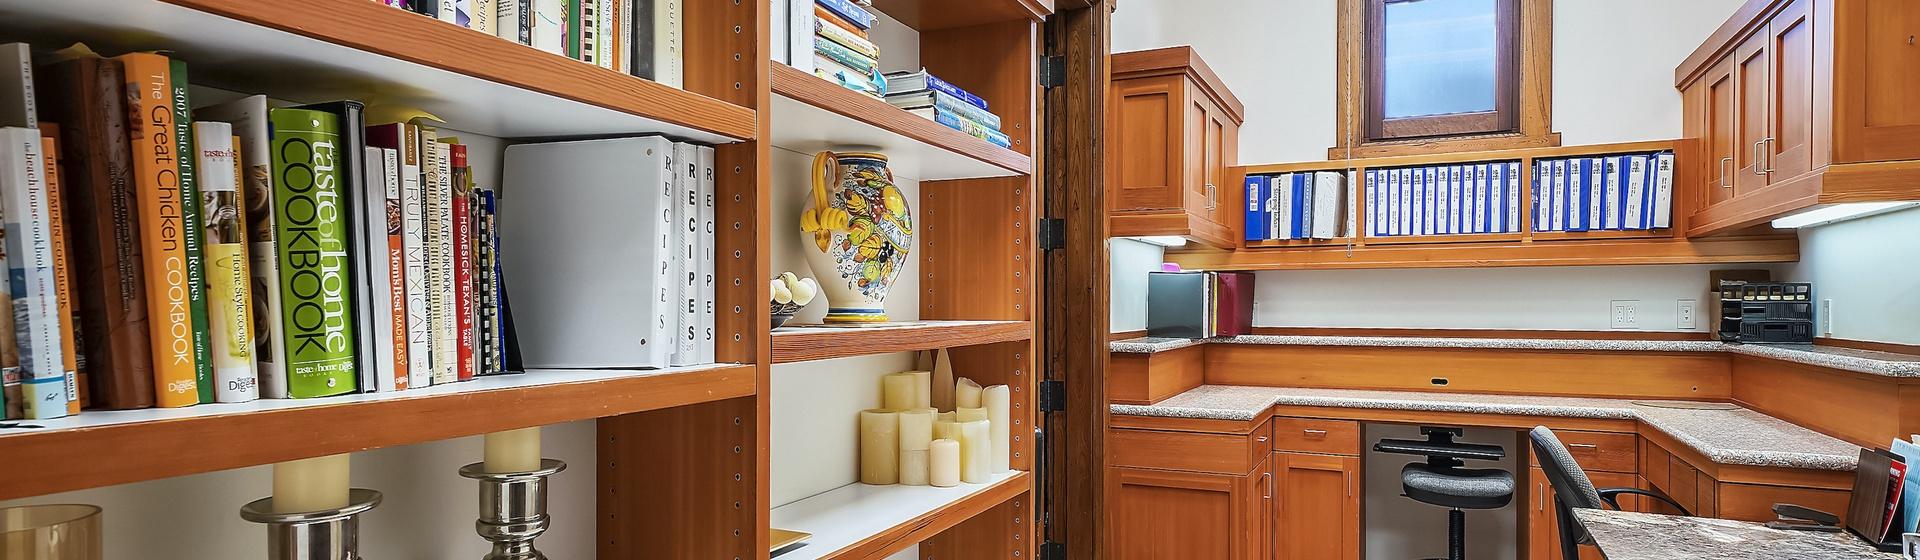 11.5-Telluride-Sleeping-Indian-Ranch-prep-kitchen-office-web.JPG